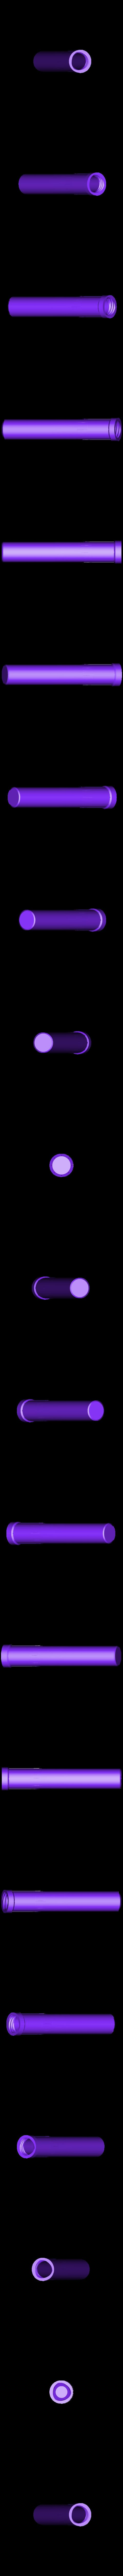 BatterySlot_Body_18.8mm.stl Download free STL file Bike Handlebar AA Battery Slot • 3D printable model, CyberCyclist